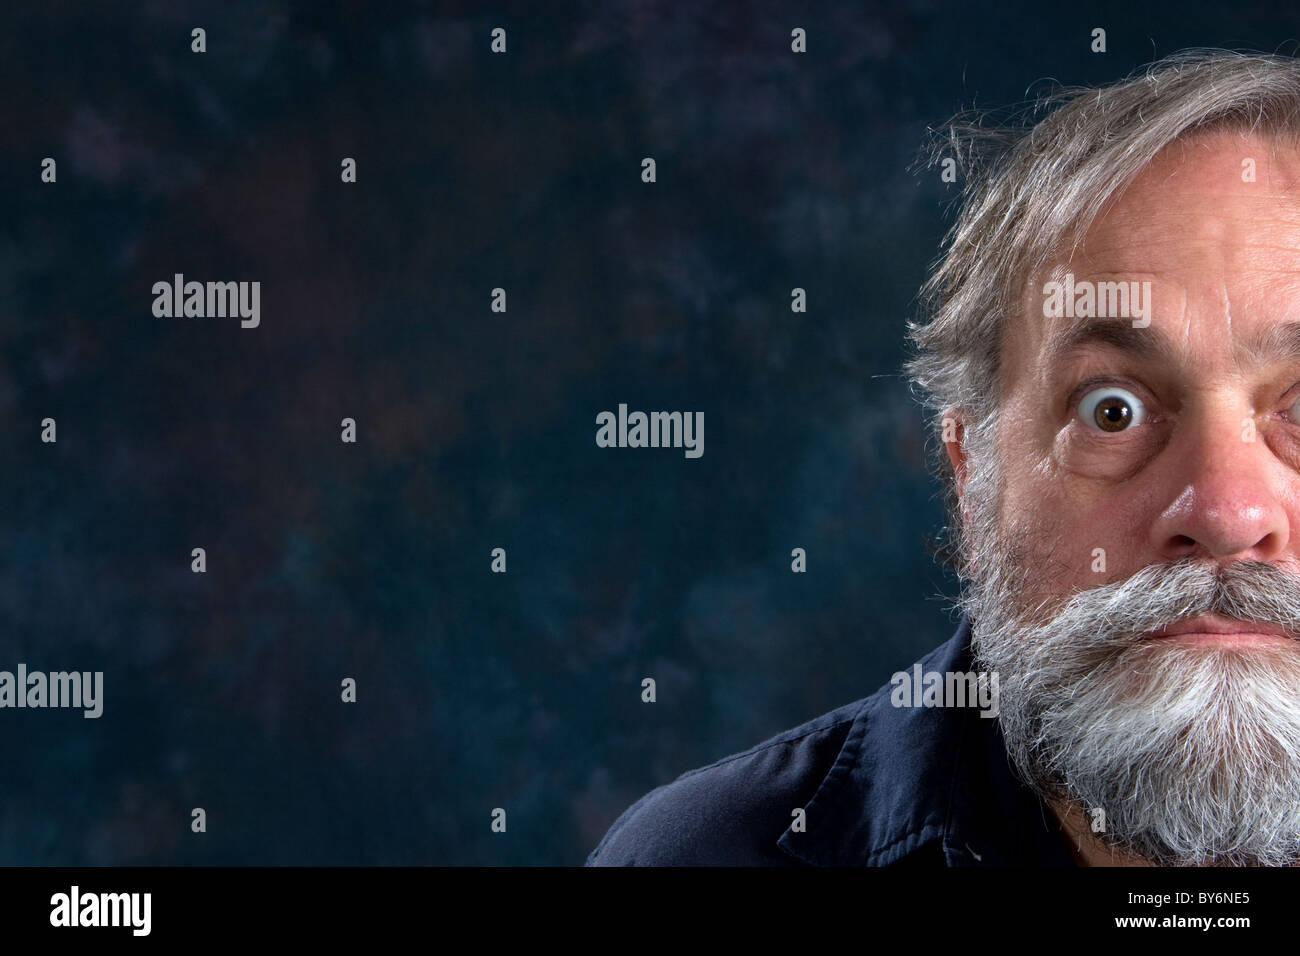 Half the face of a bug eyed mature man with beard. - Stock Image